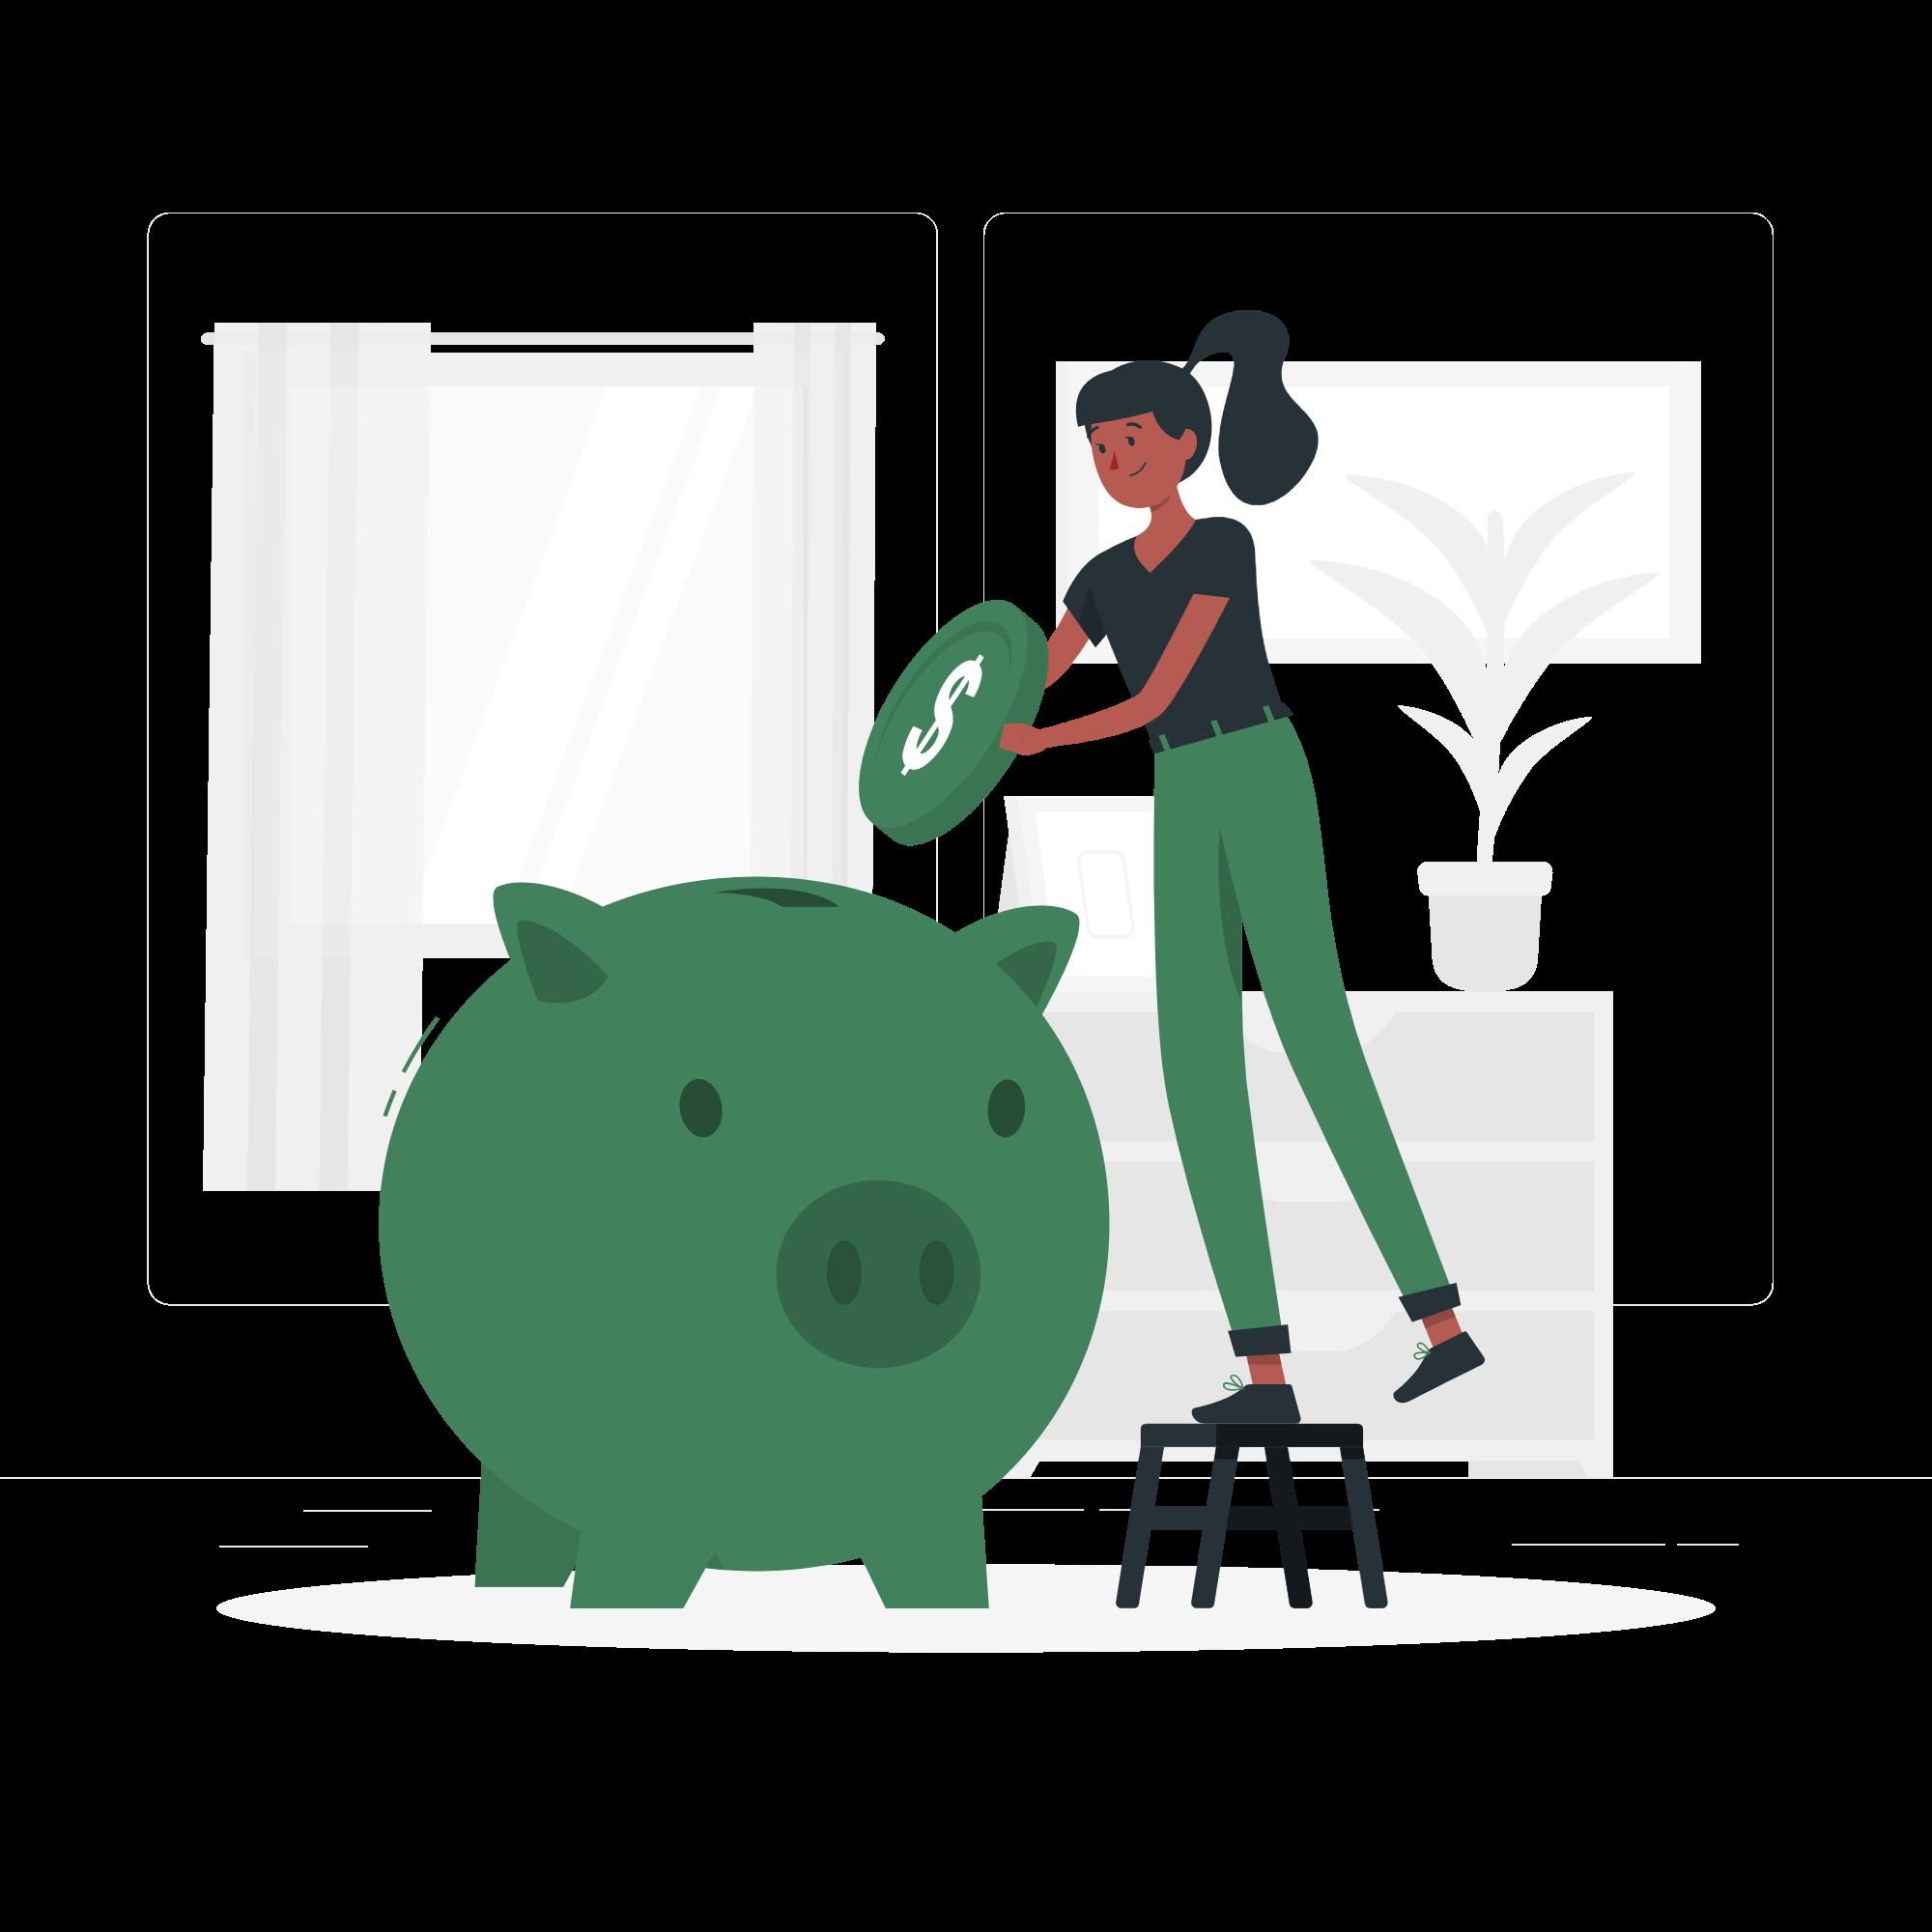 "<a href=""https://storyset.com/finance"">Illustration by Freepik Storyset</a>"